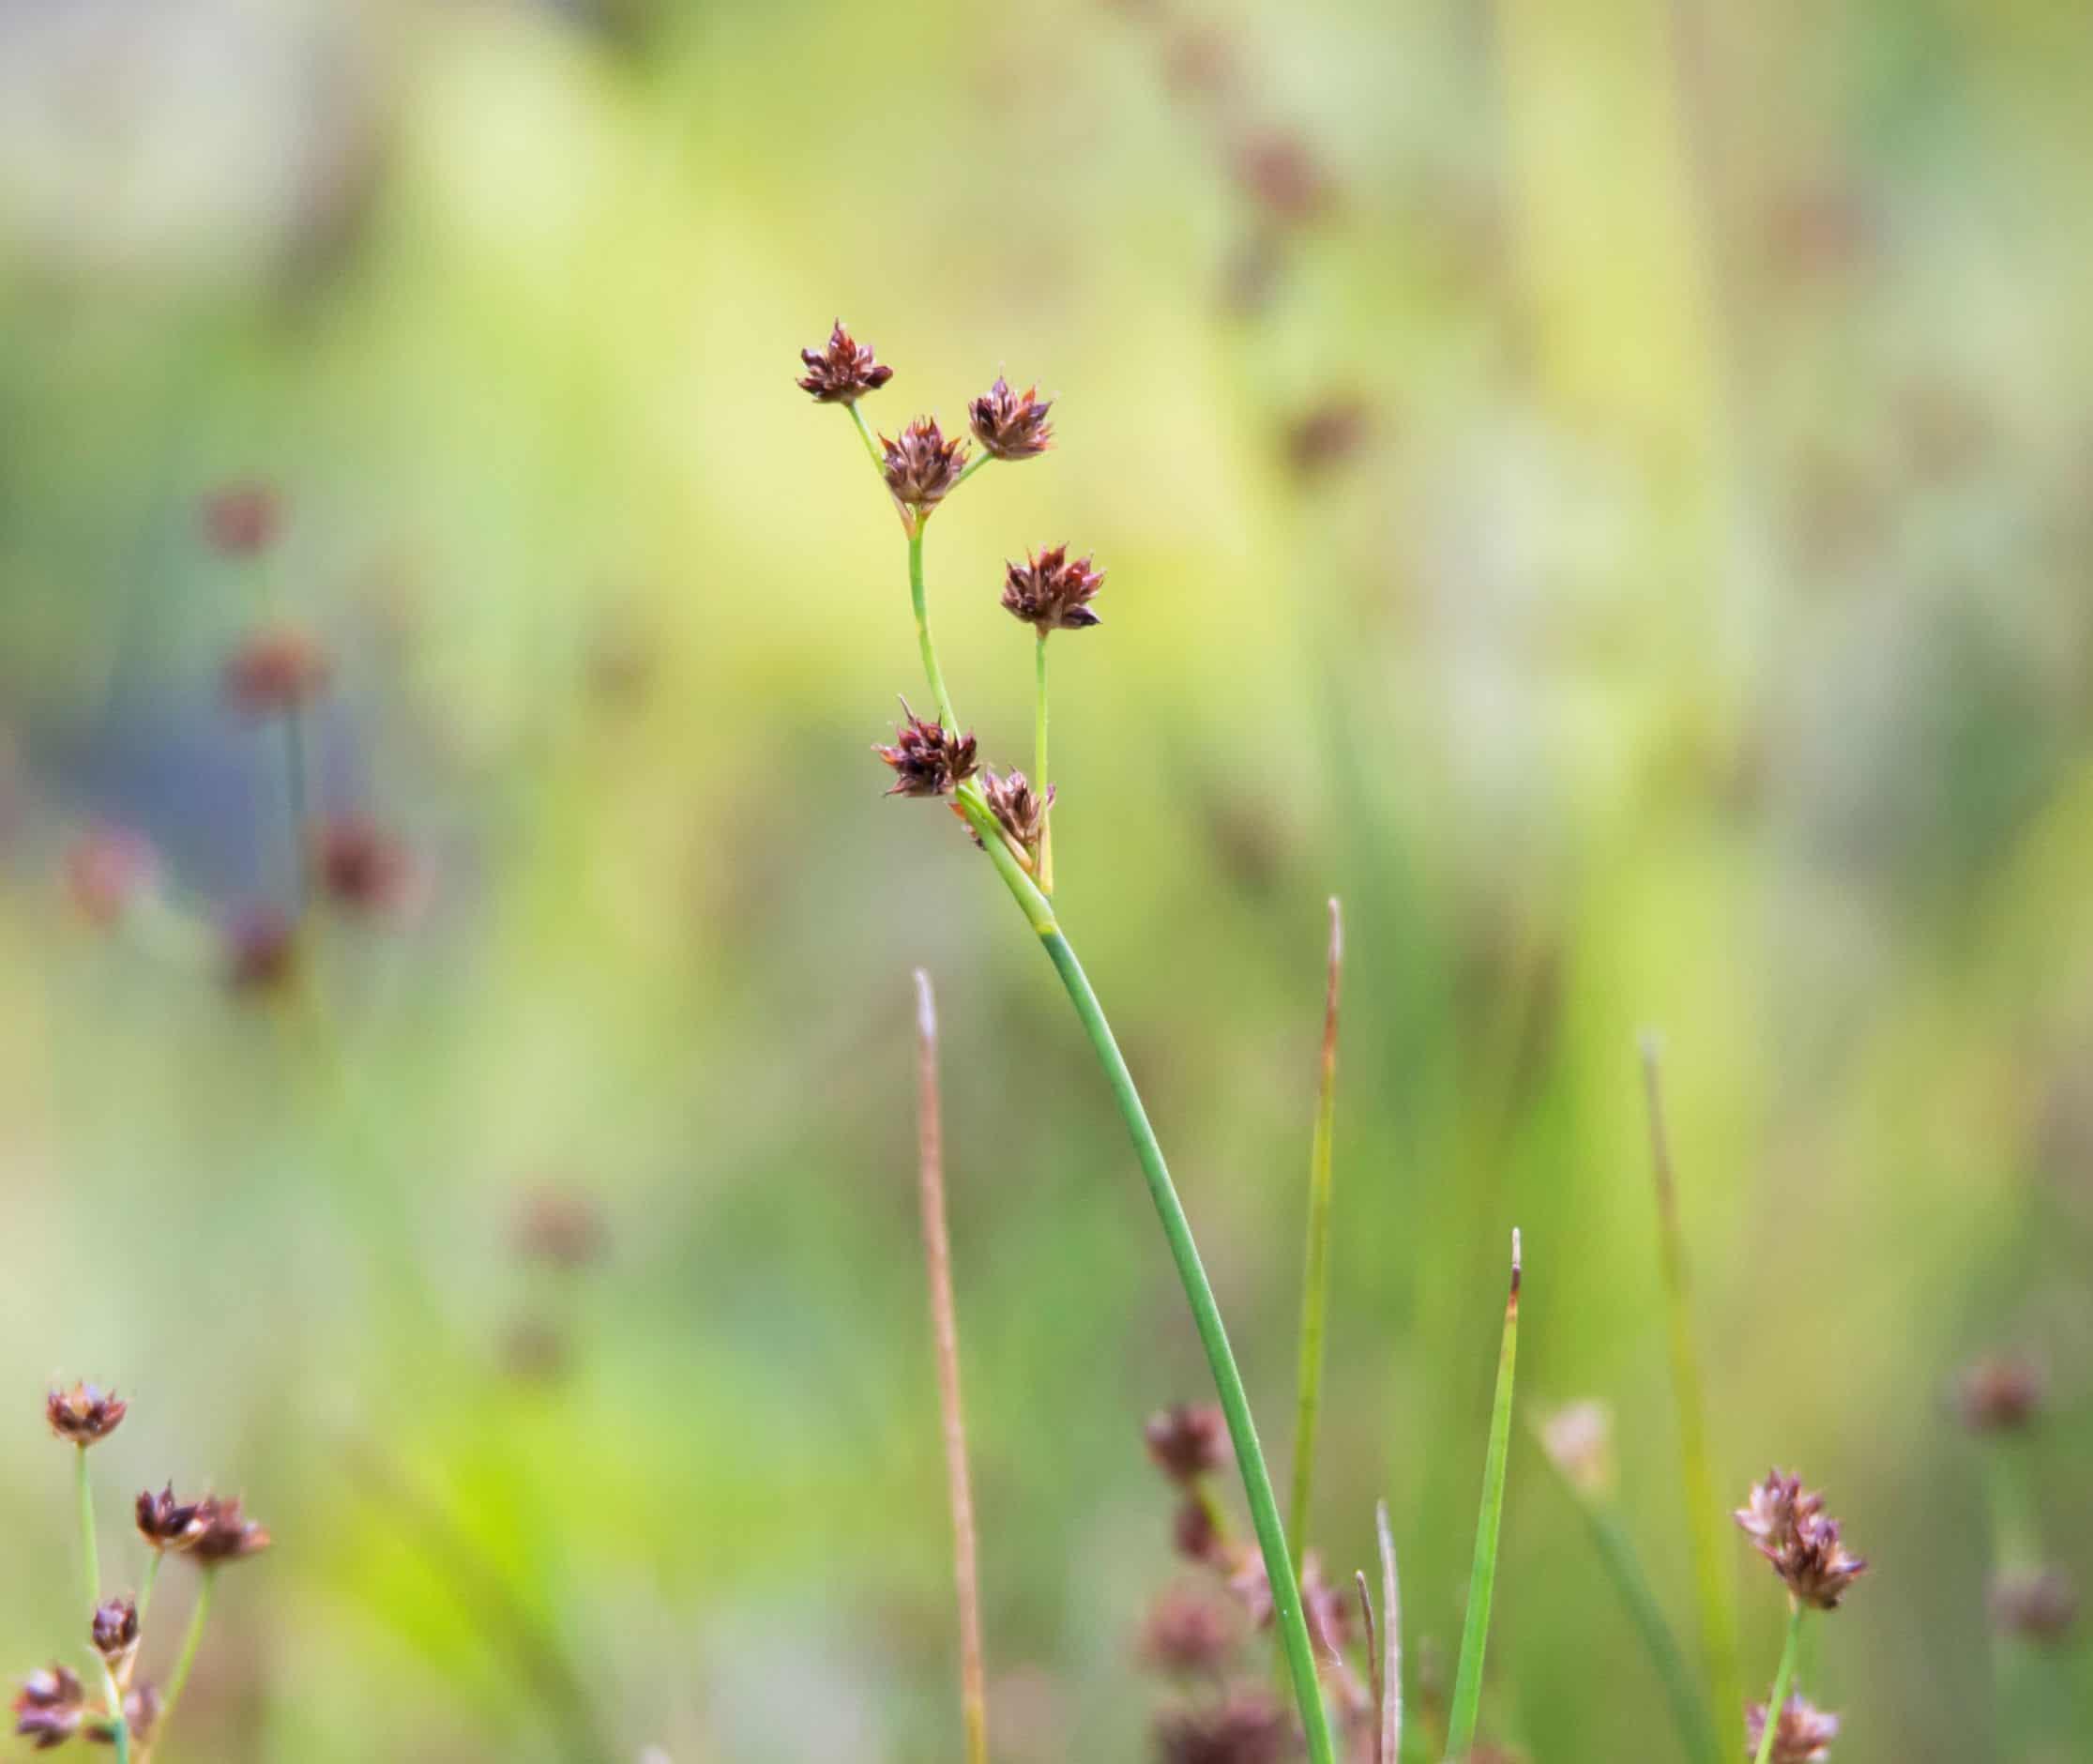 Purple spikerush is an aquatic plant.